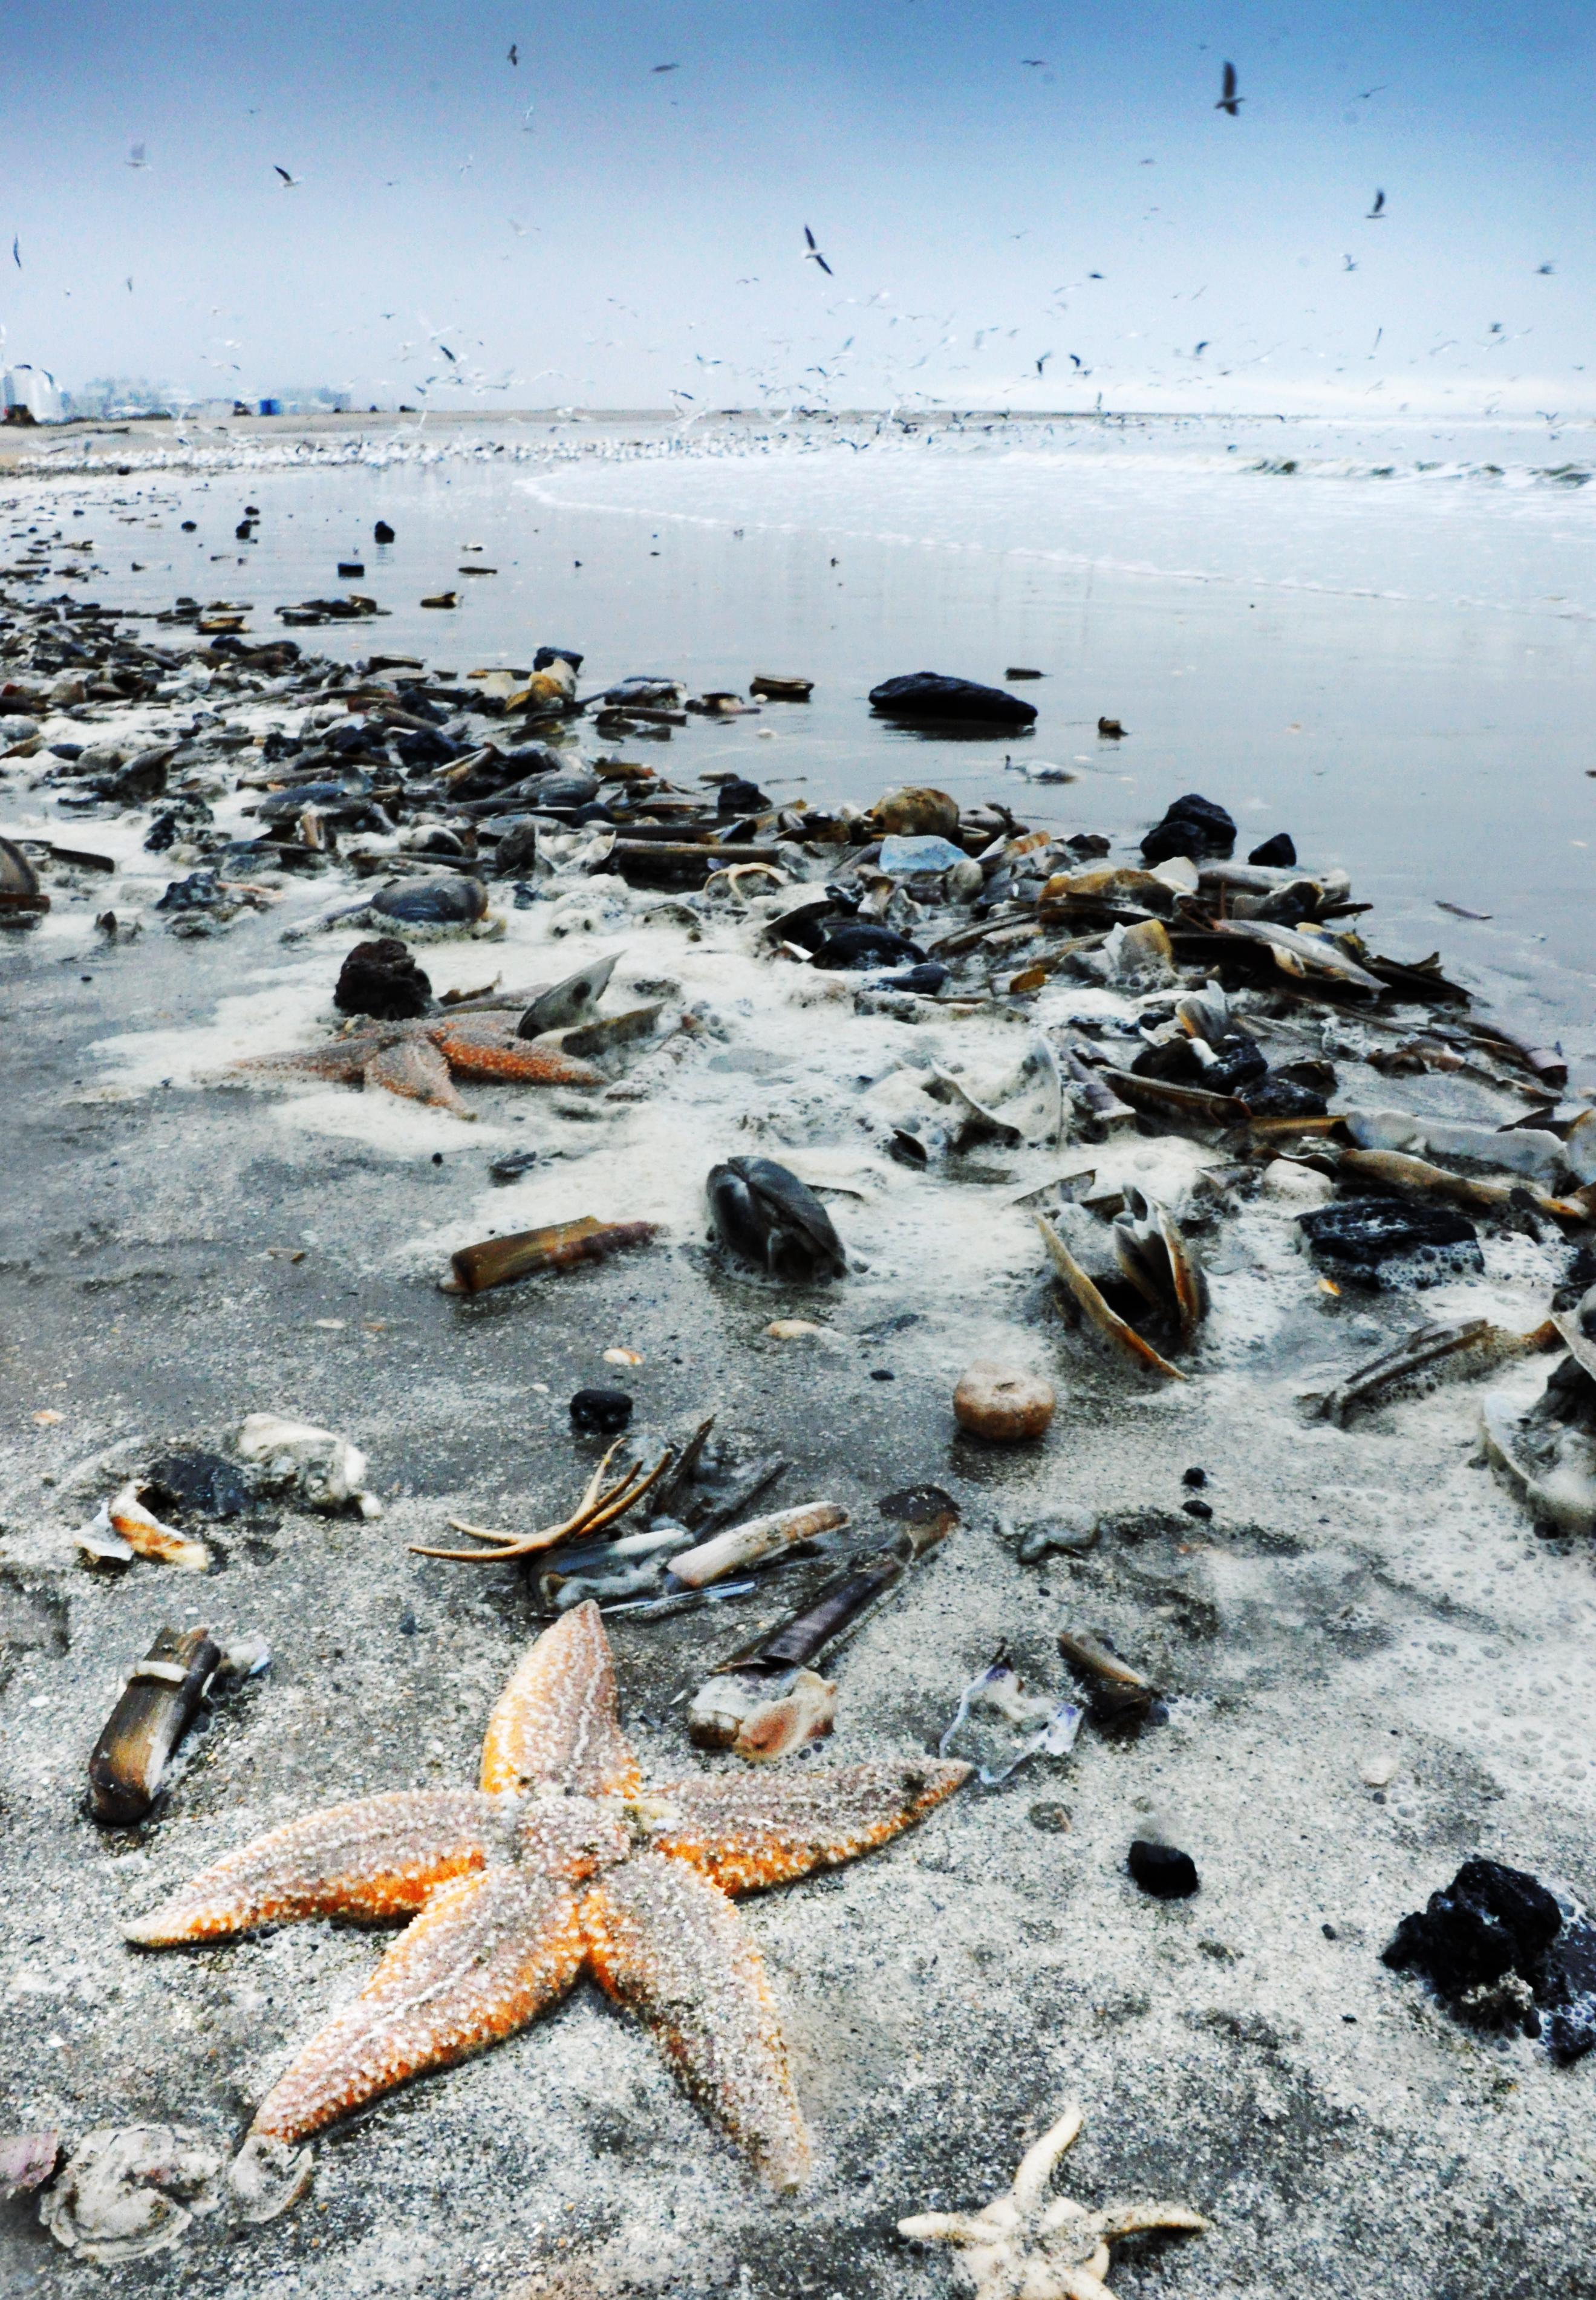 Starfish and shells washed to shore photo